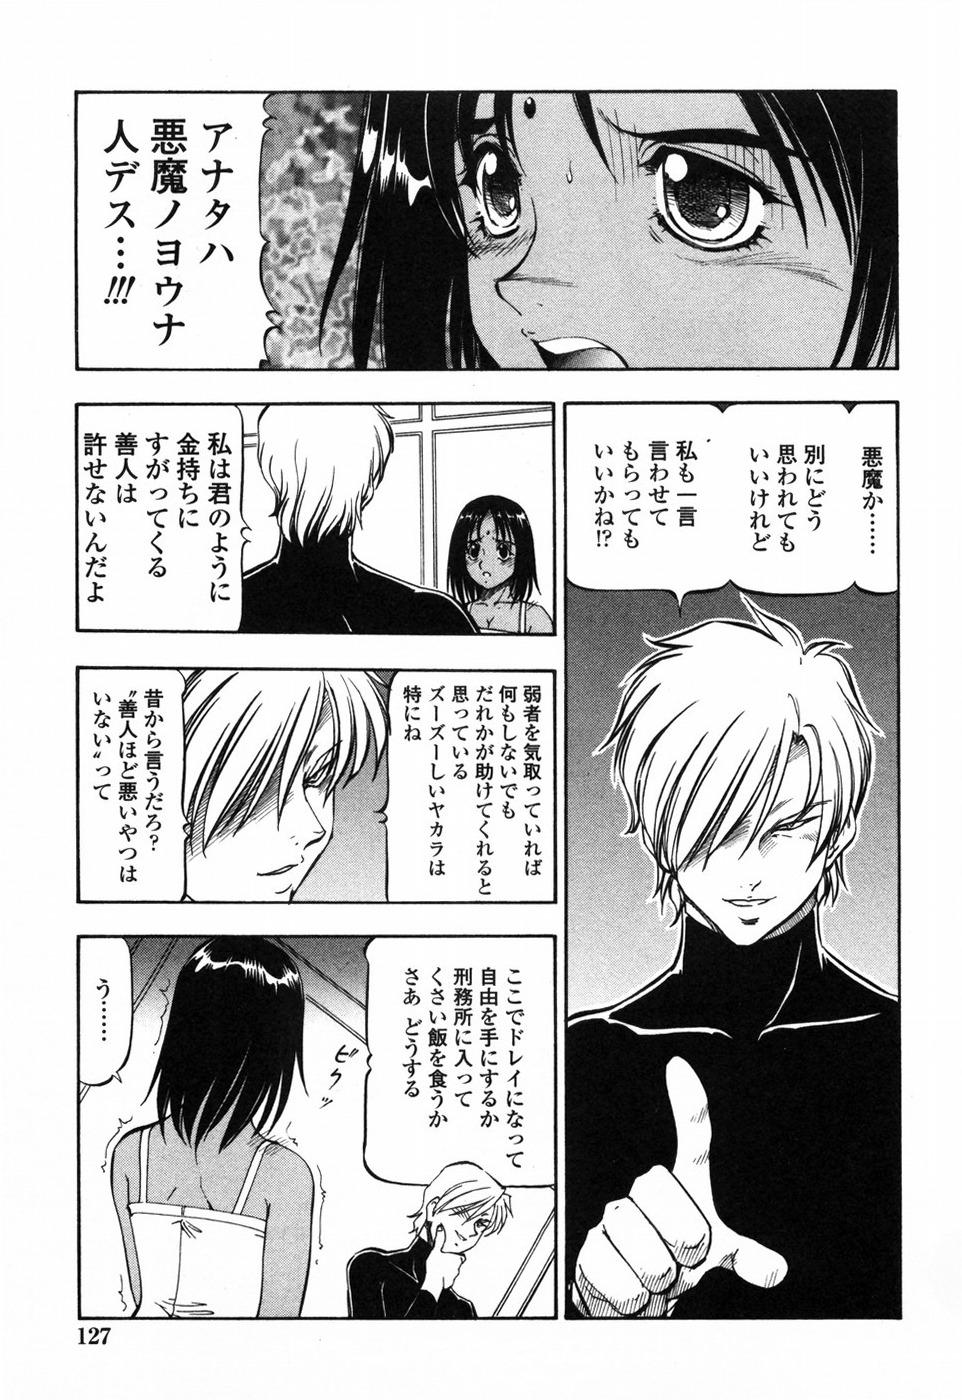 Kichiku Houteishiki - Equation of brutal person 133